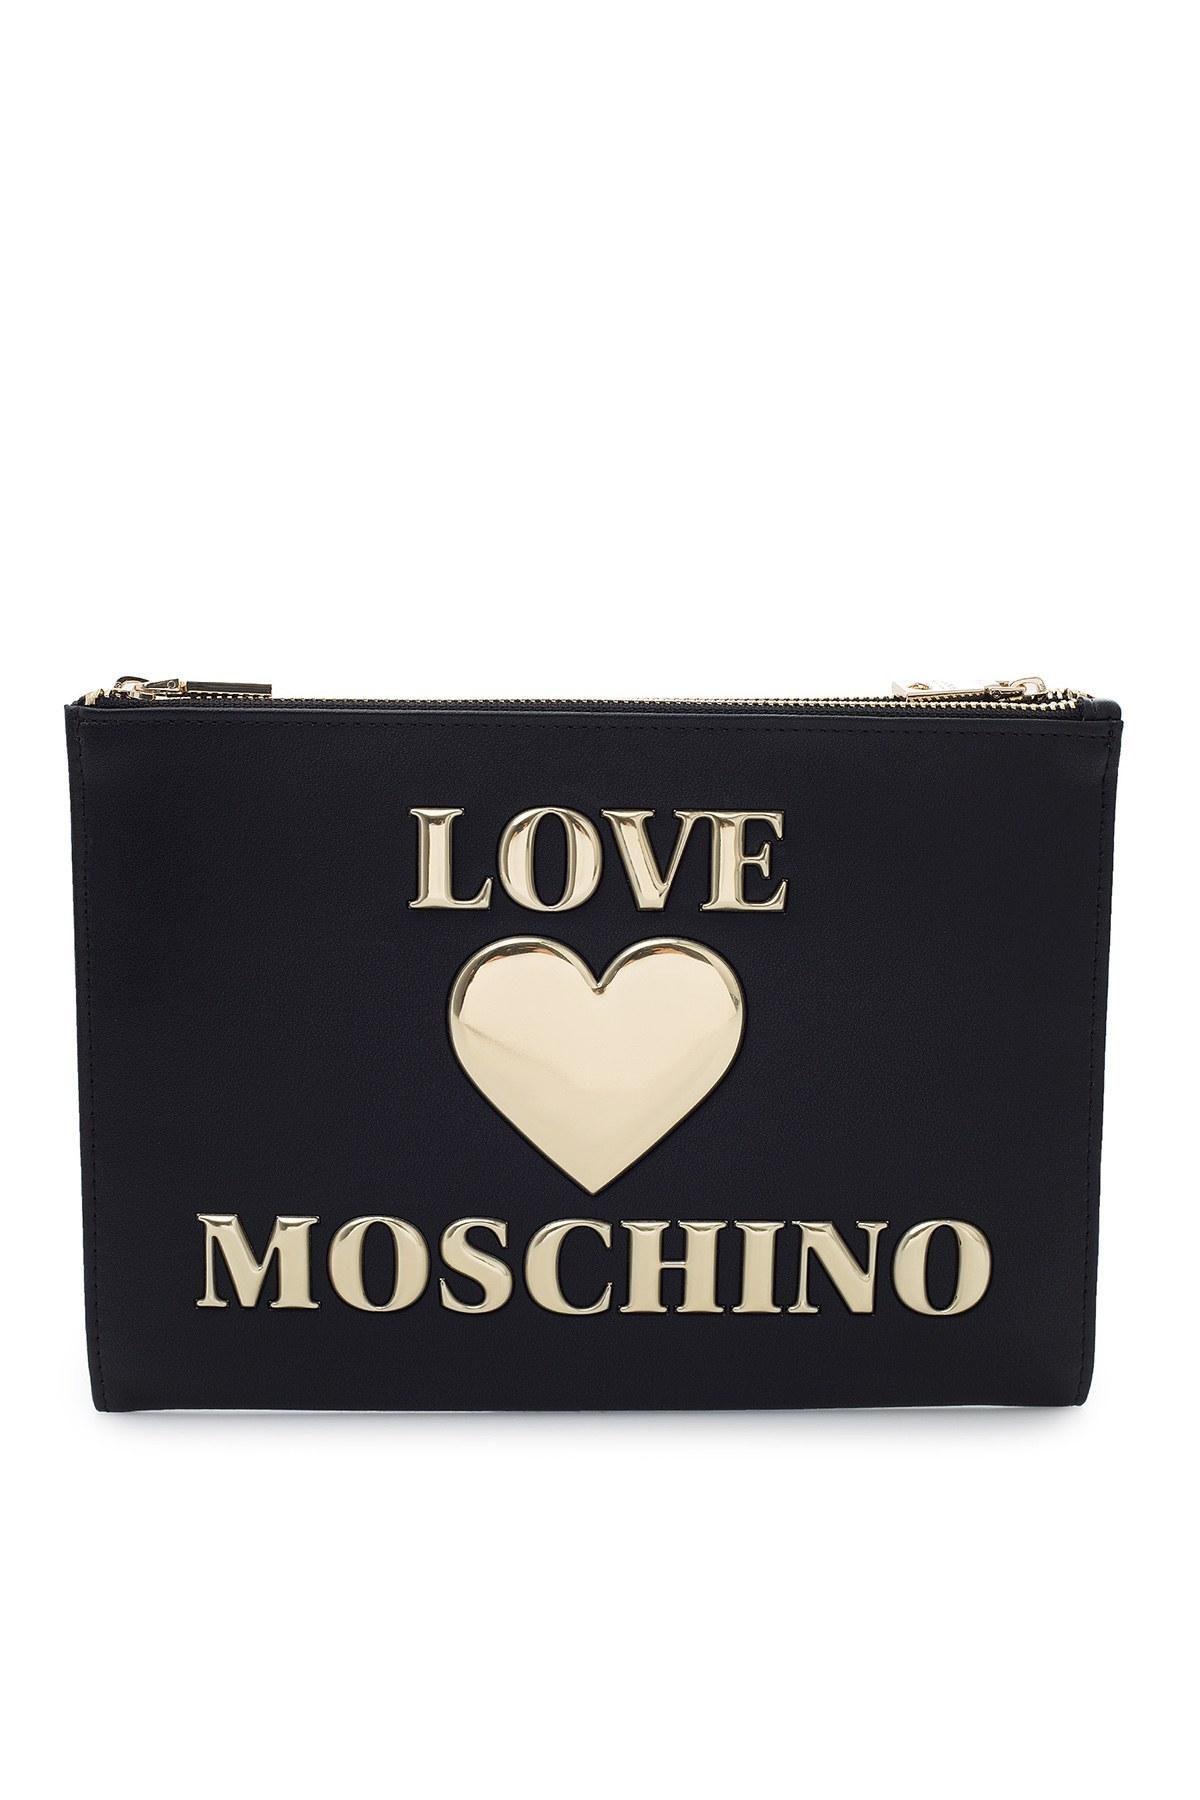 Love Moschino Logo Baskılı Bayan Çanta JC5615PP1BLE0000 SİYAH